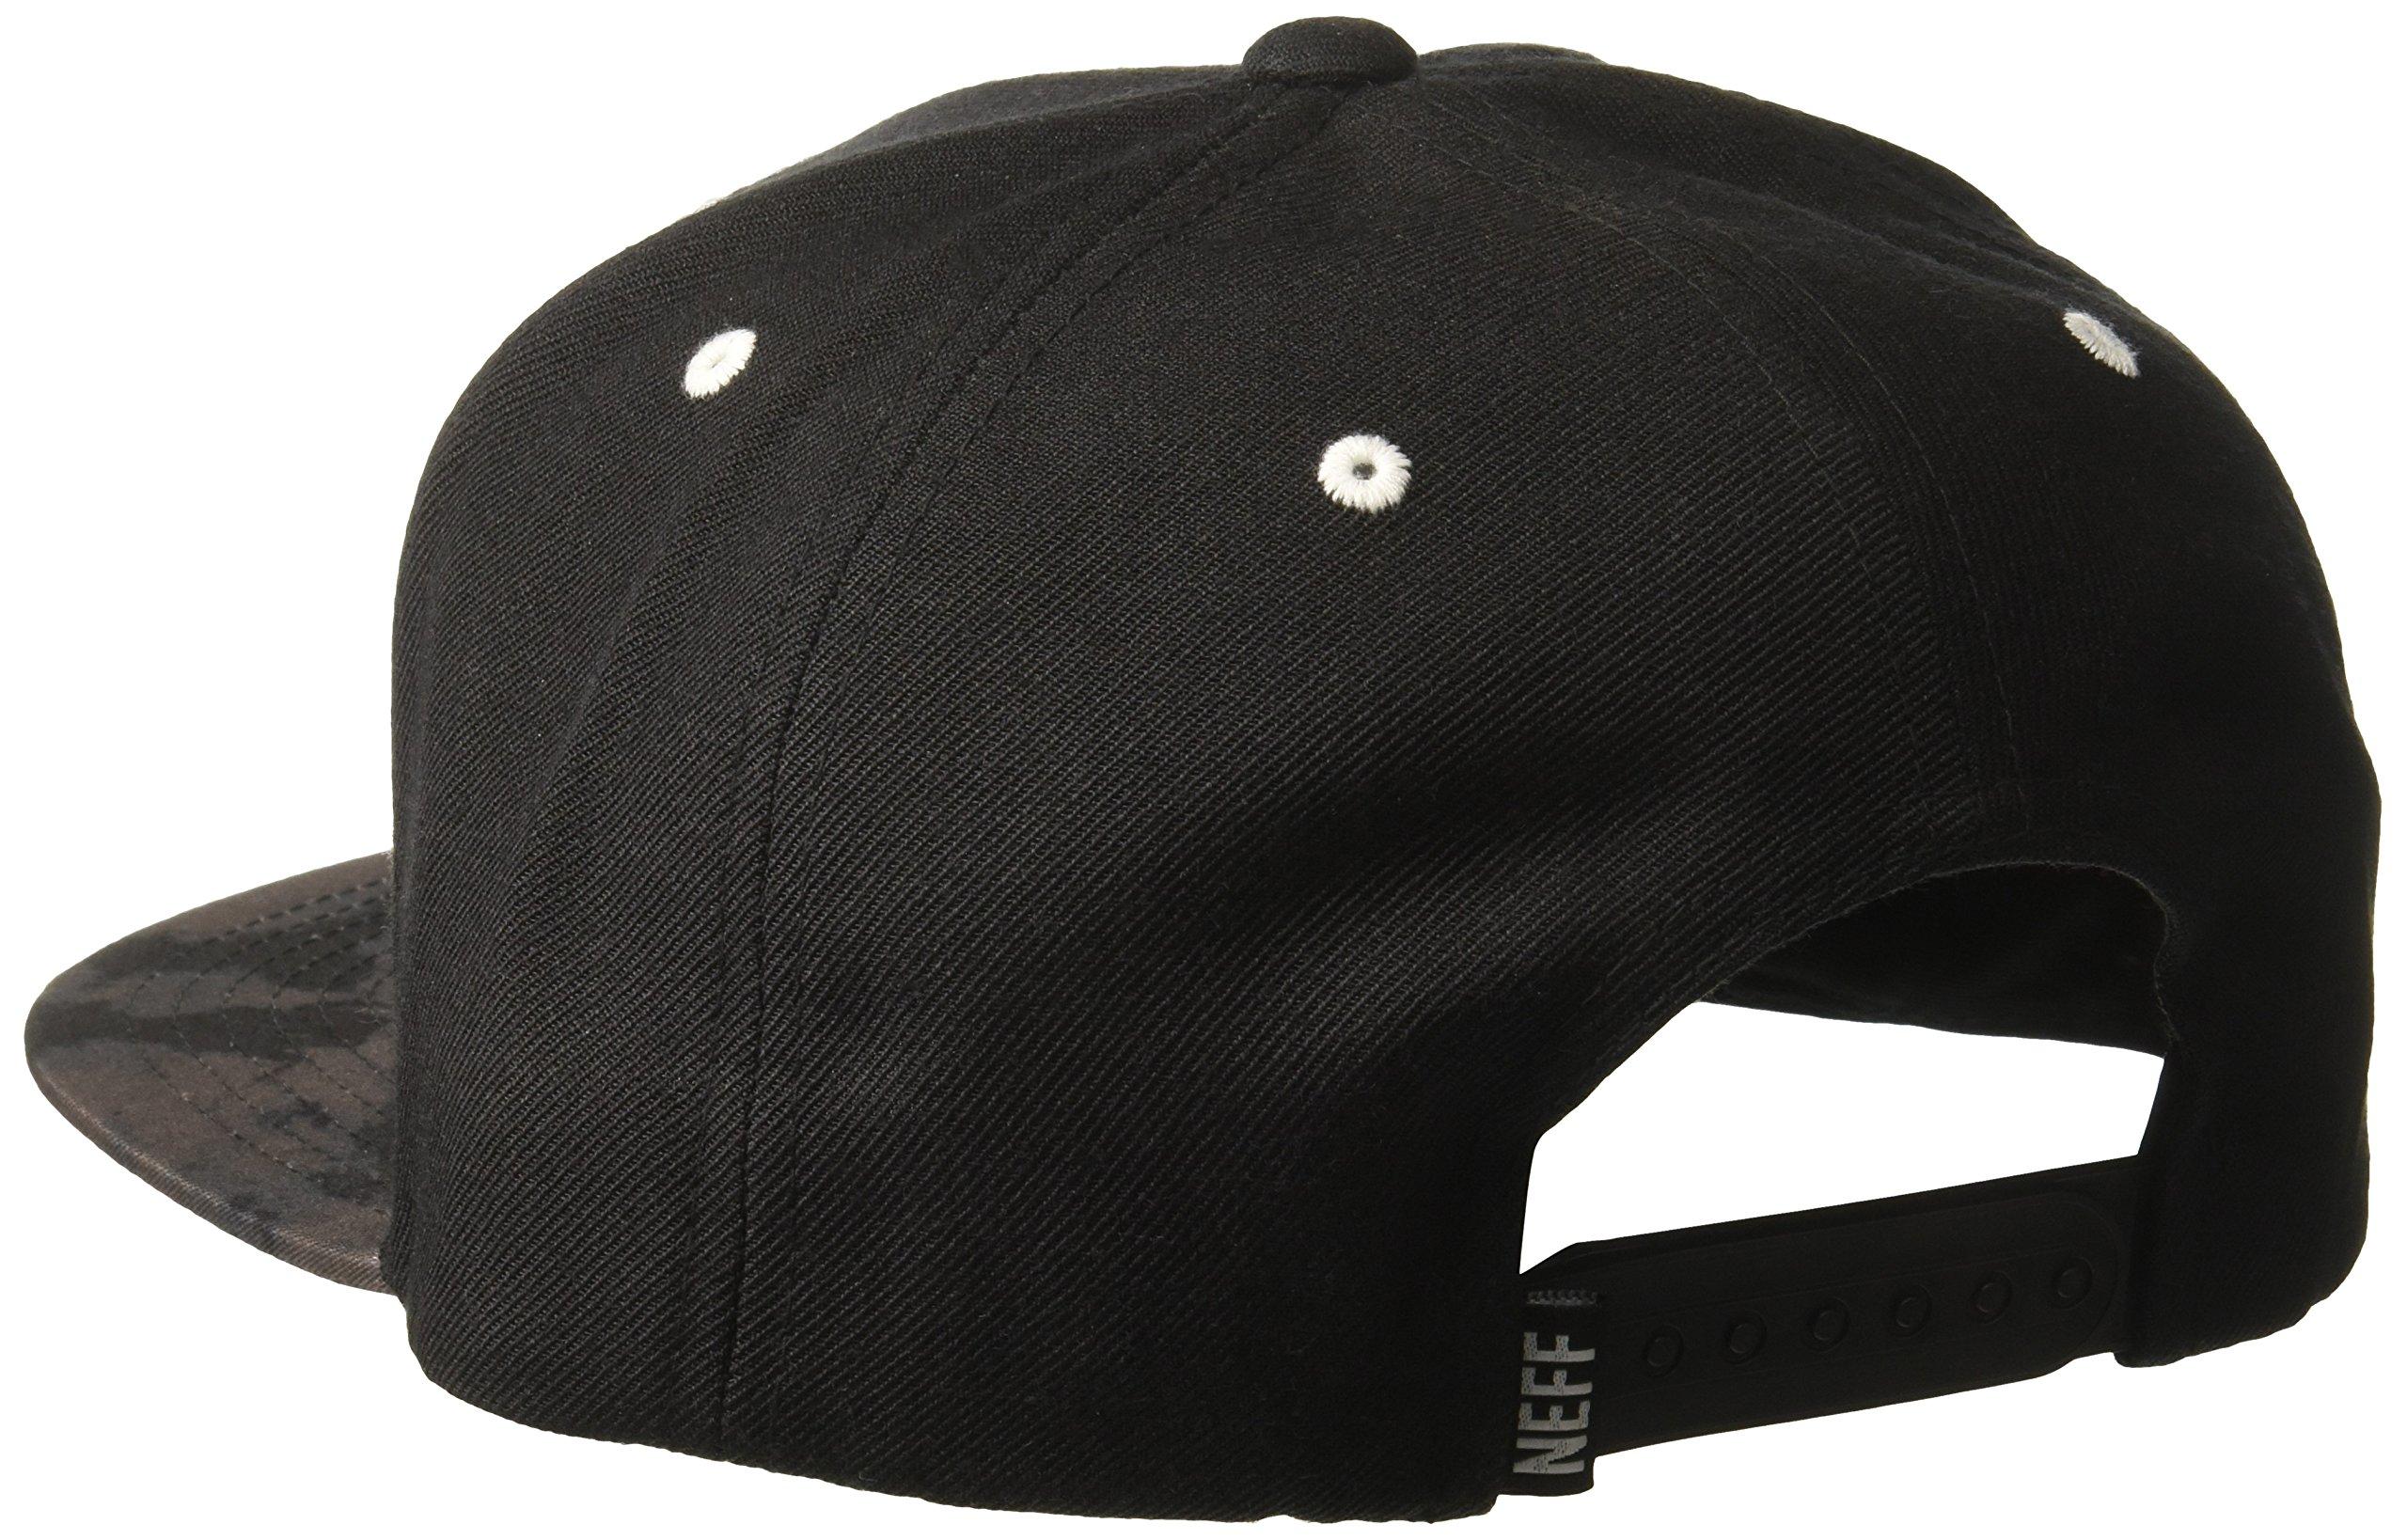 NEFF Men's Daily Cap, Black Wash, One Size by NEFF (Image #2)